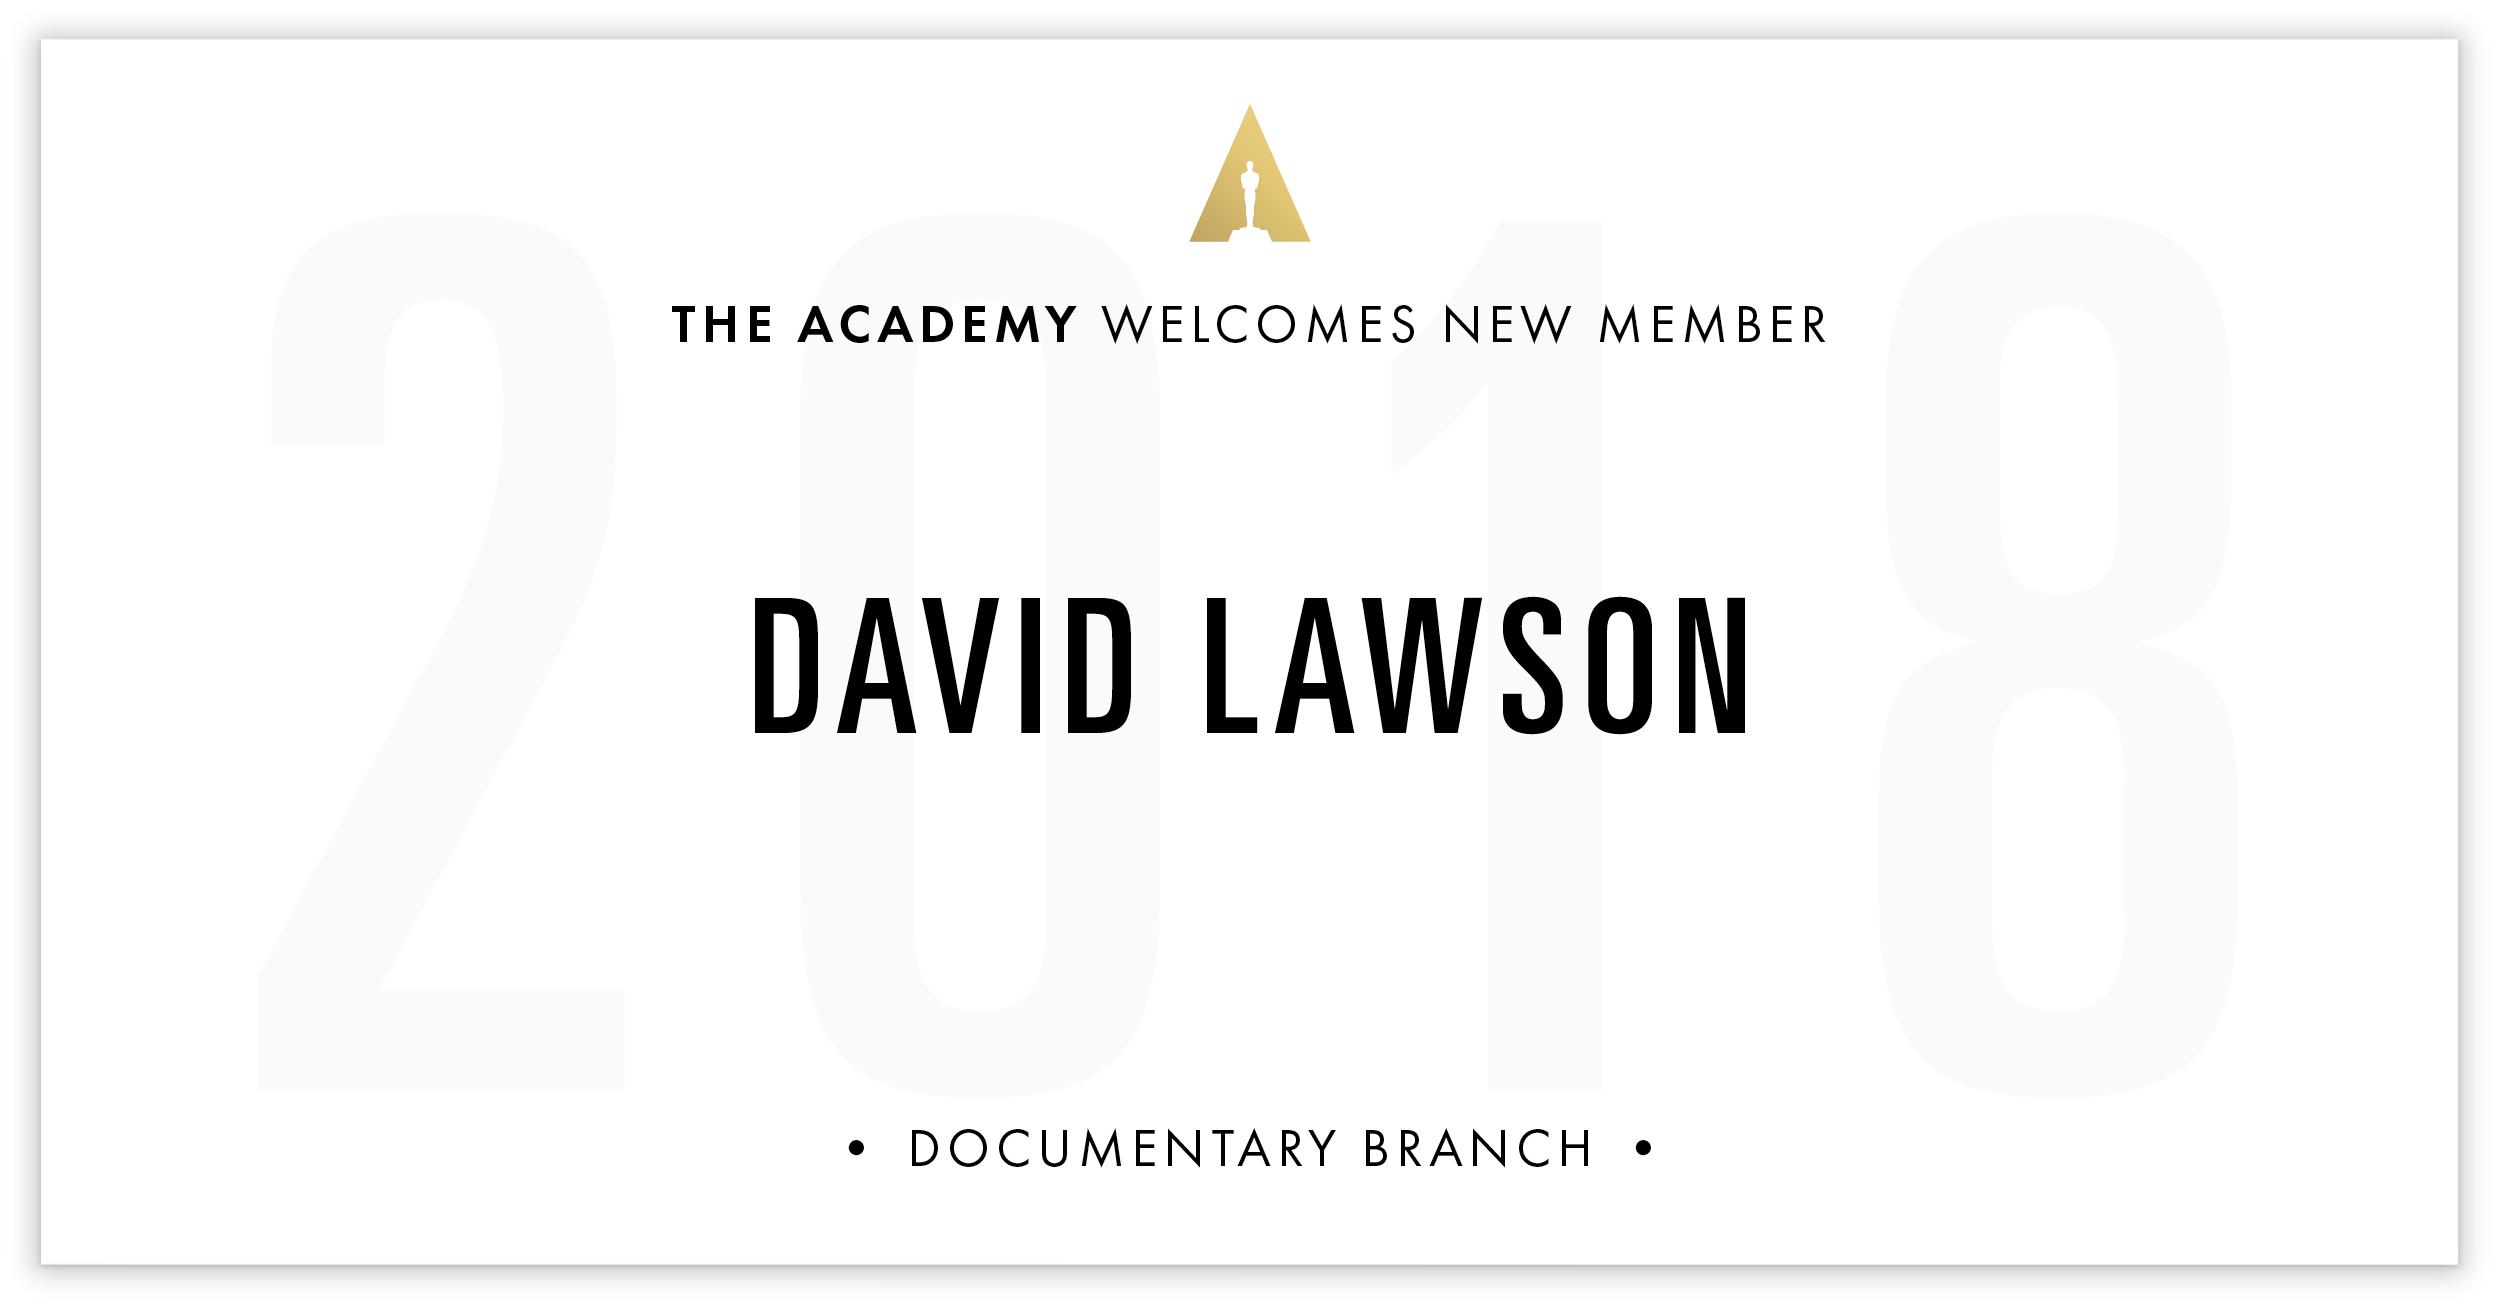 David Lawson is invited!